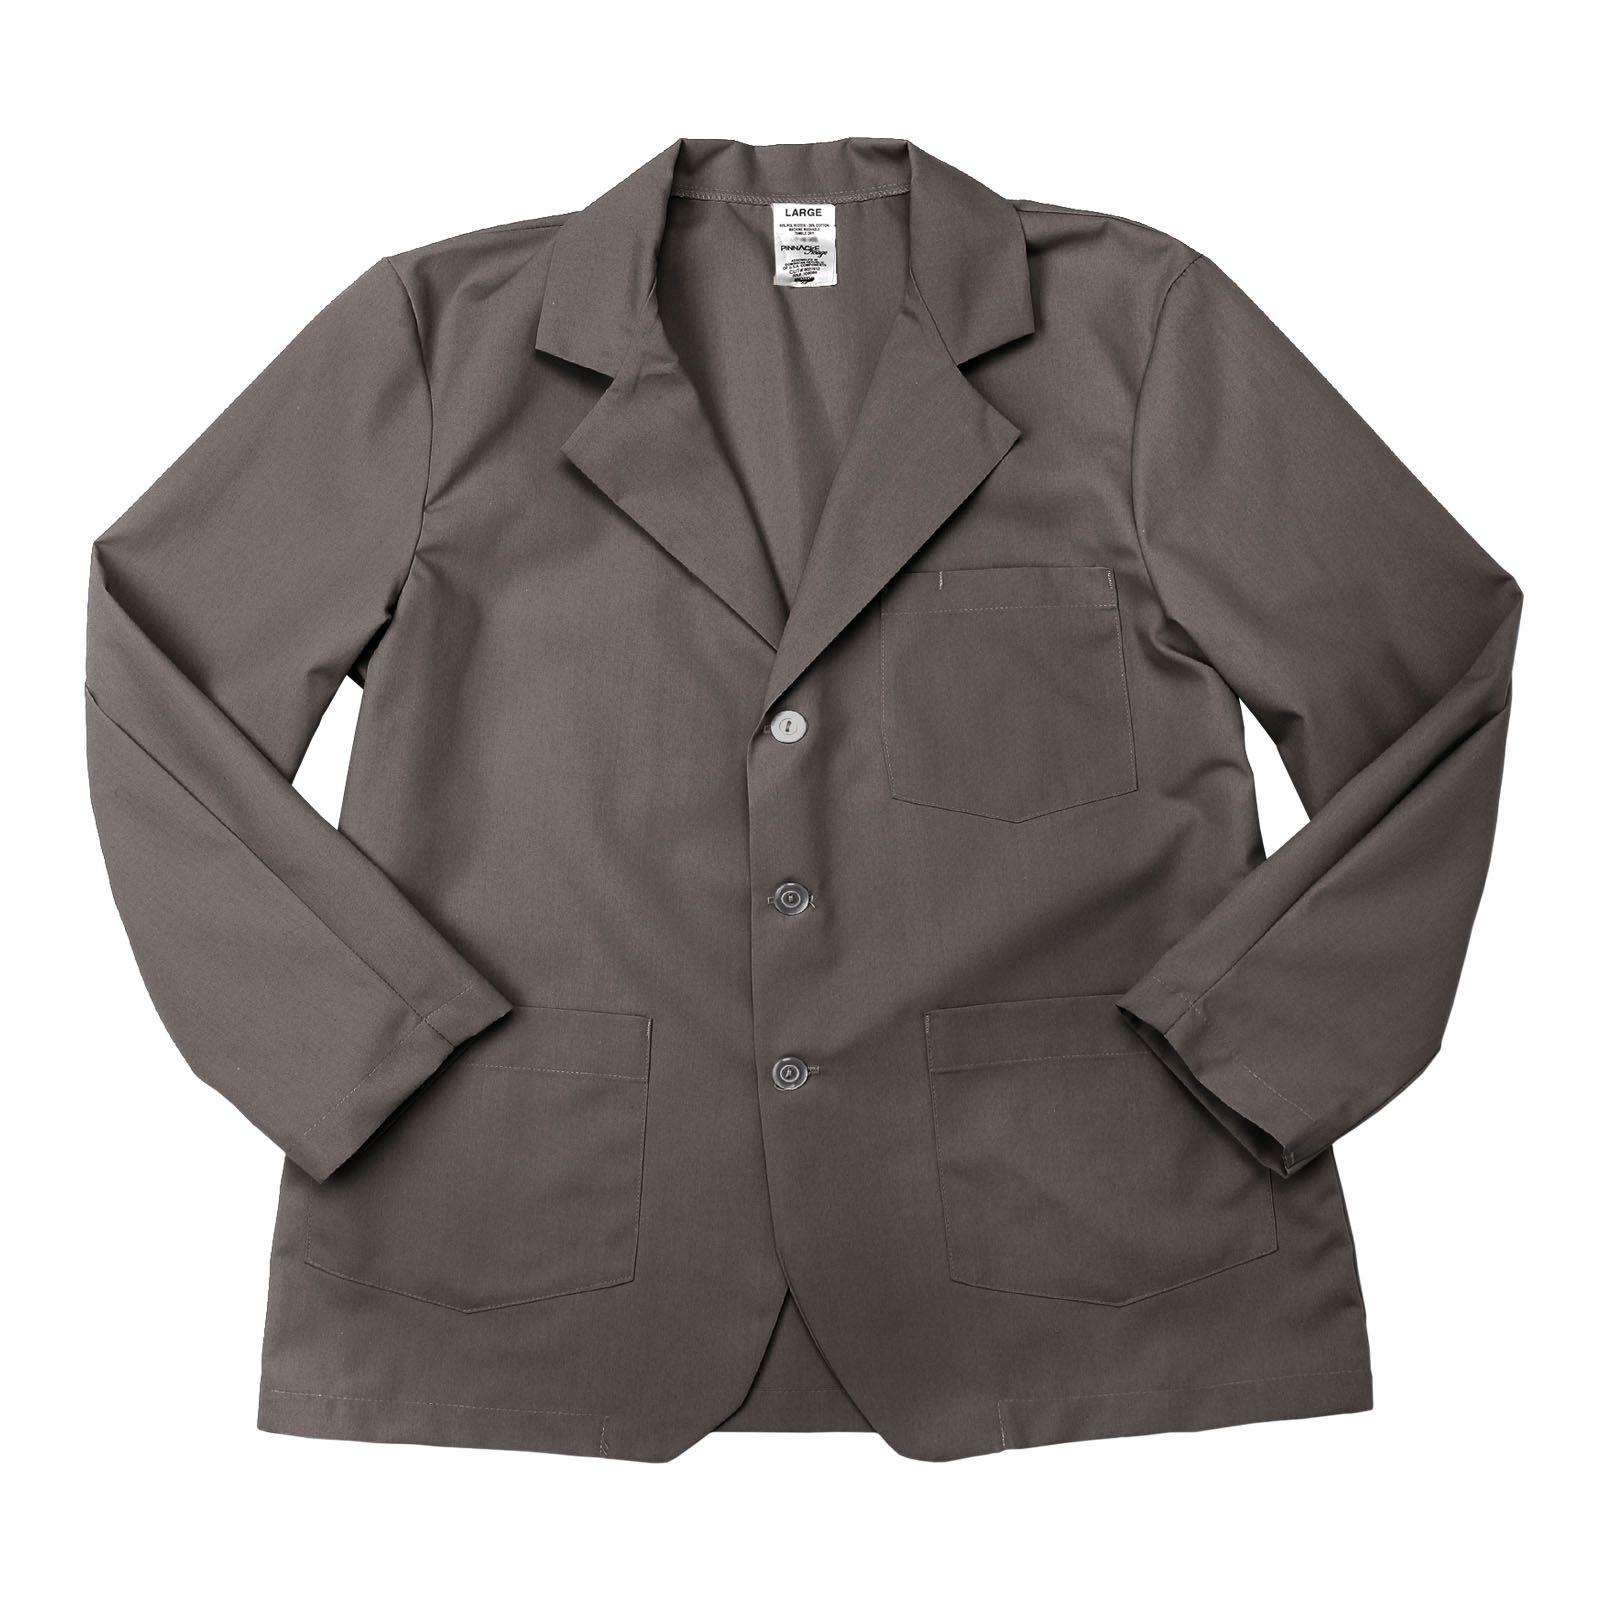 65/35 Poly/Cotton Poplin Lapel/Counter Coat-PINNACLE IMAGE